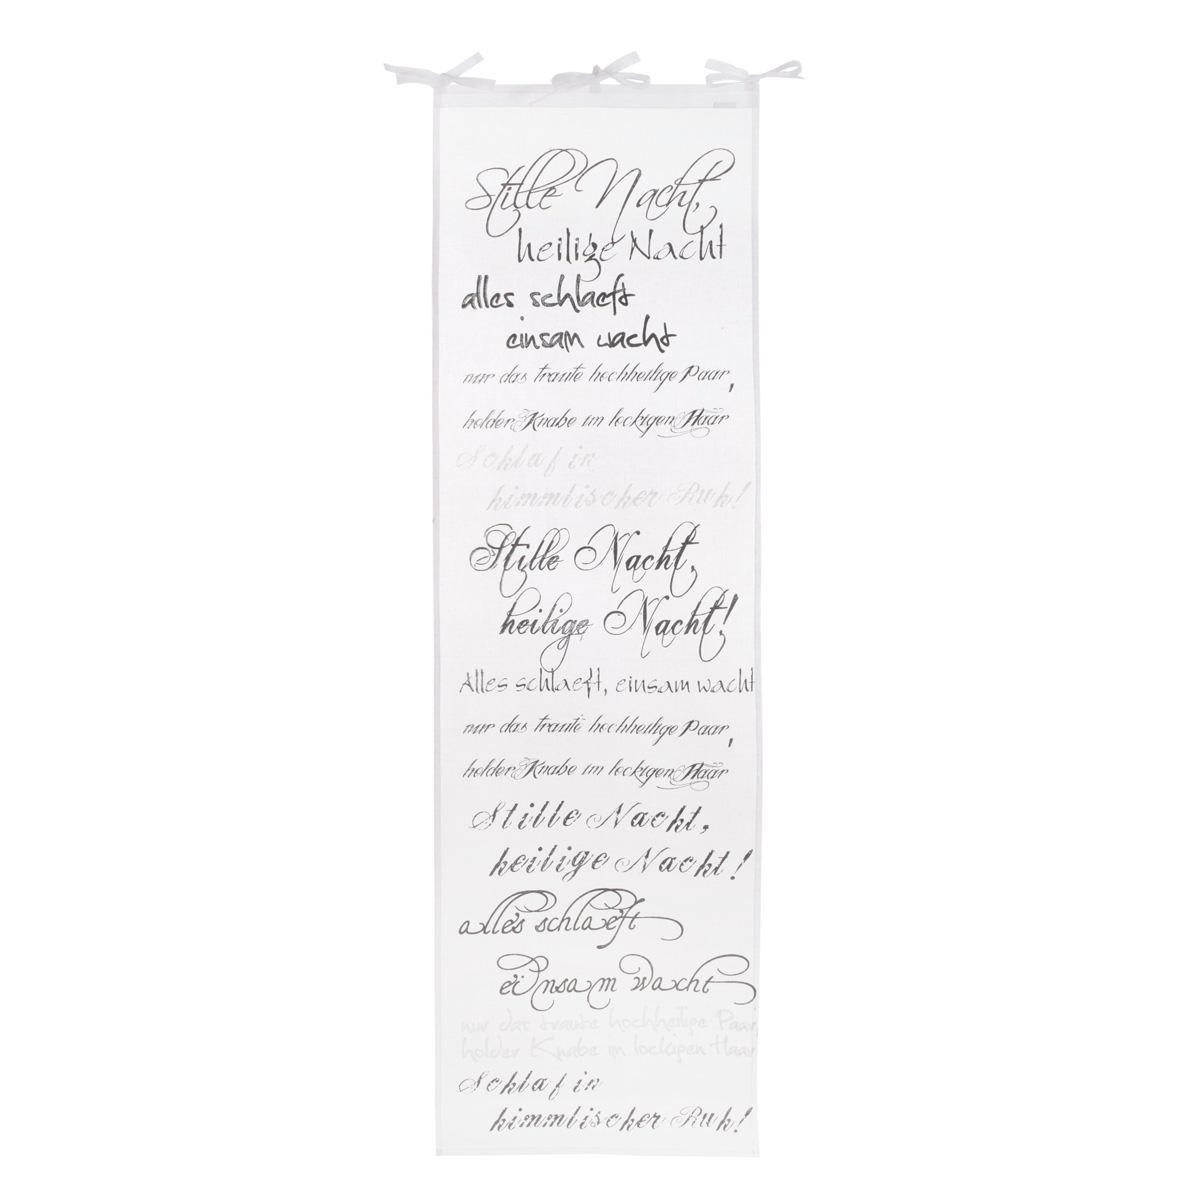 Organdy Vorhang, transparent, Baumwolle